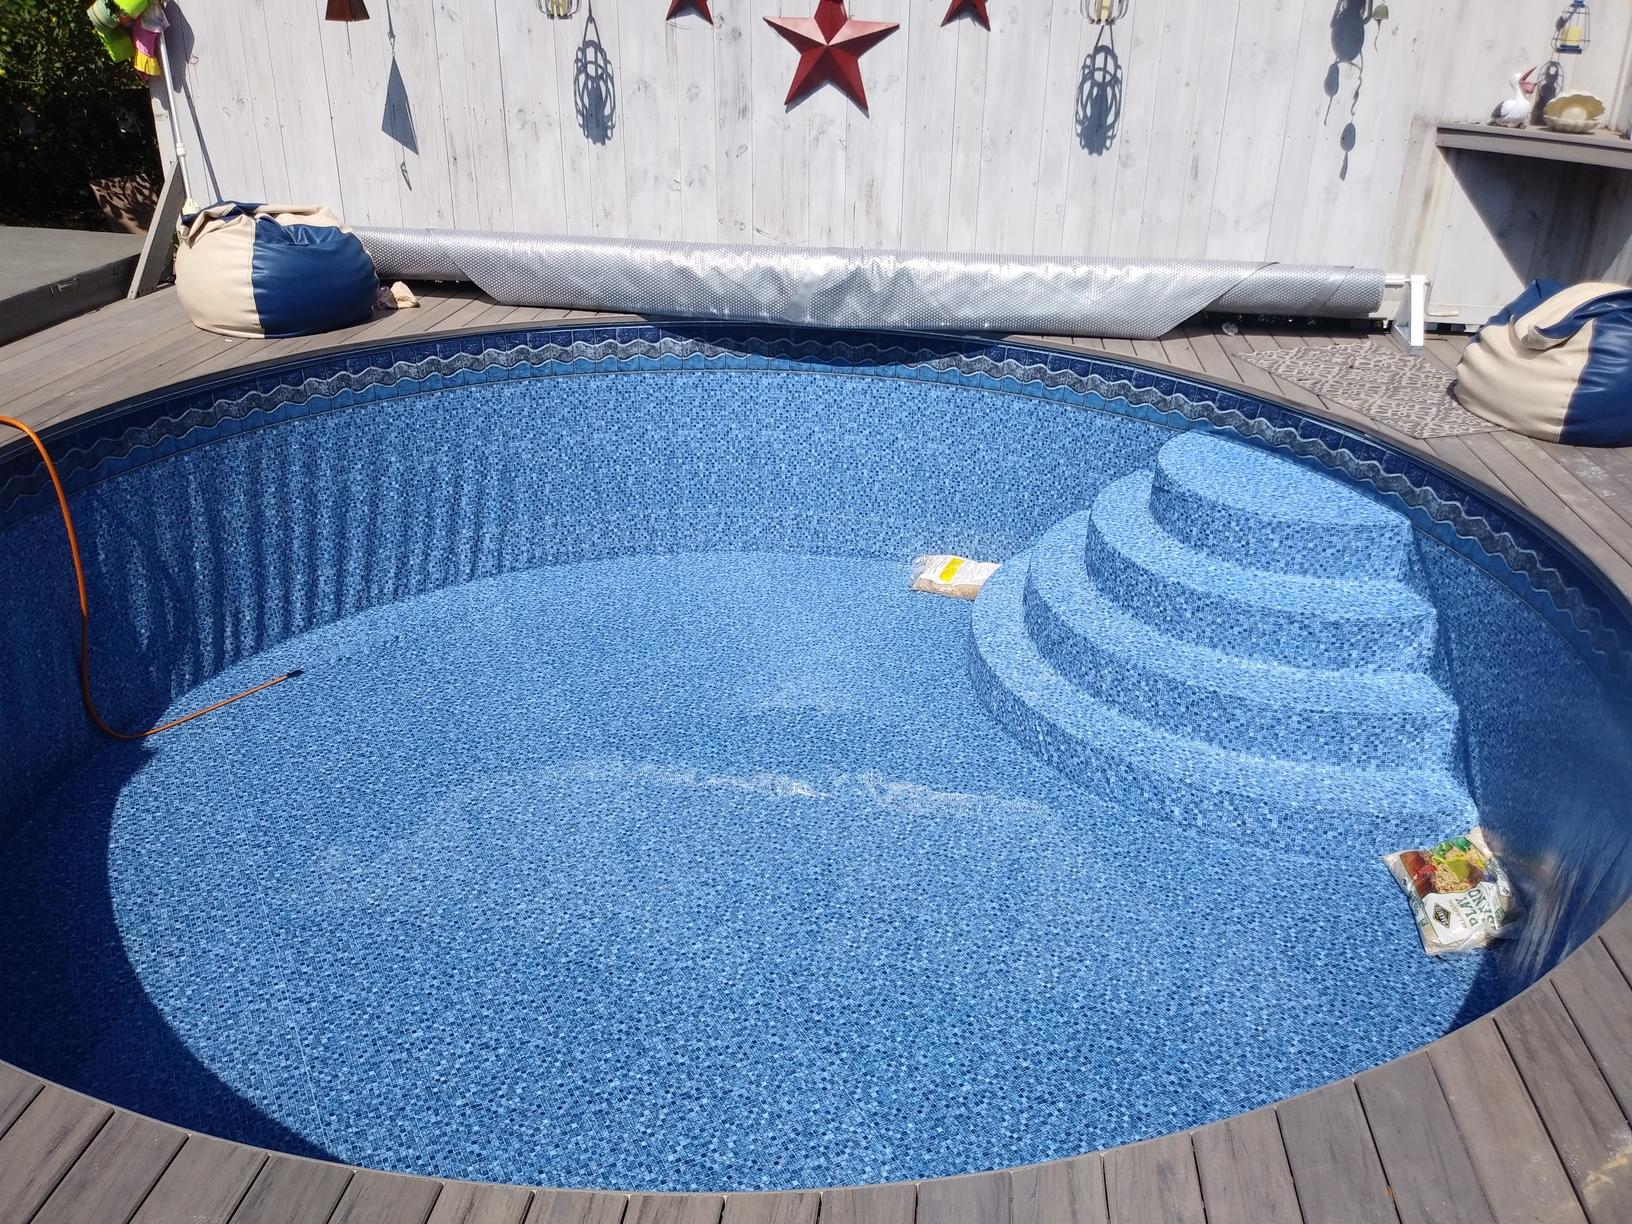 Finished Pool!